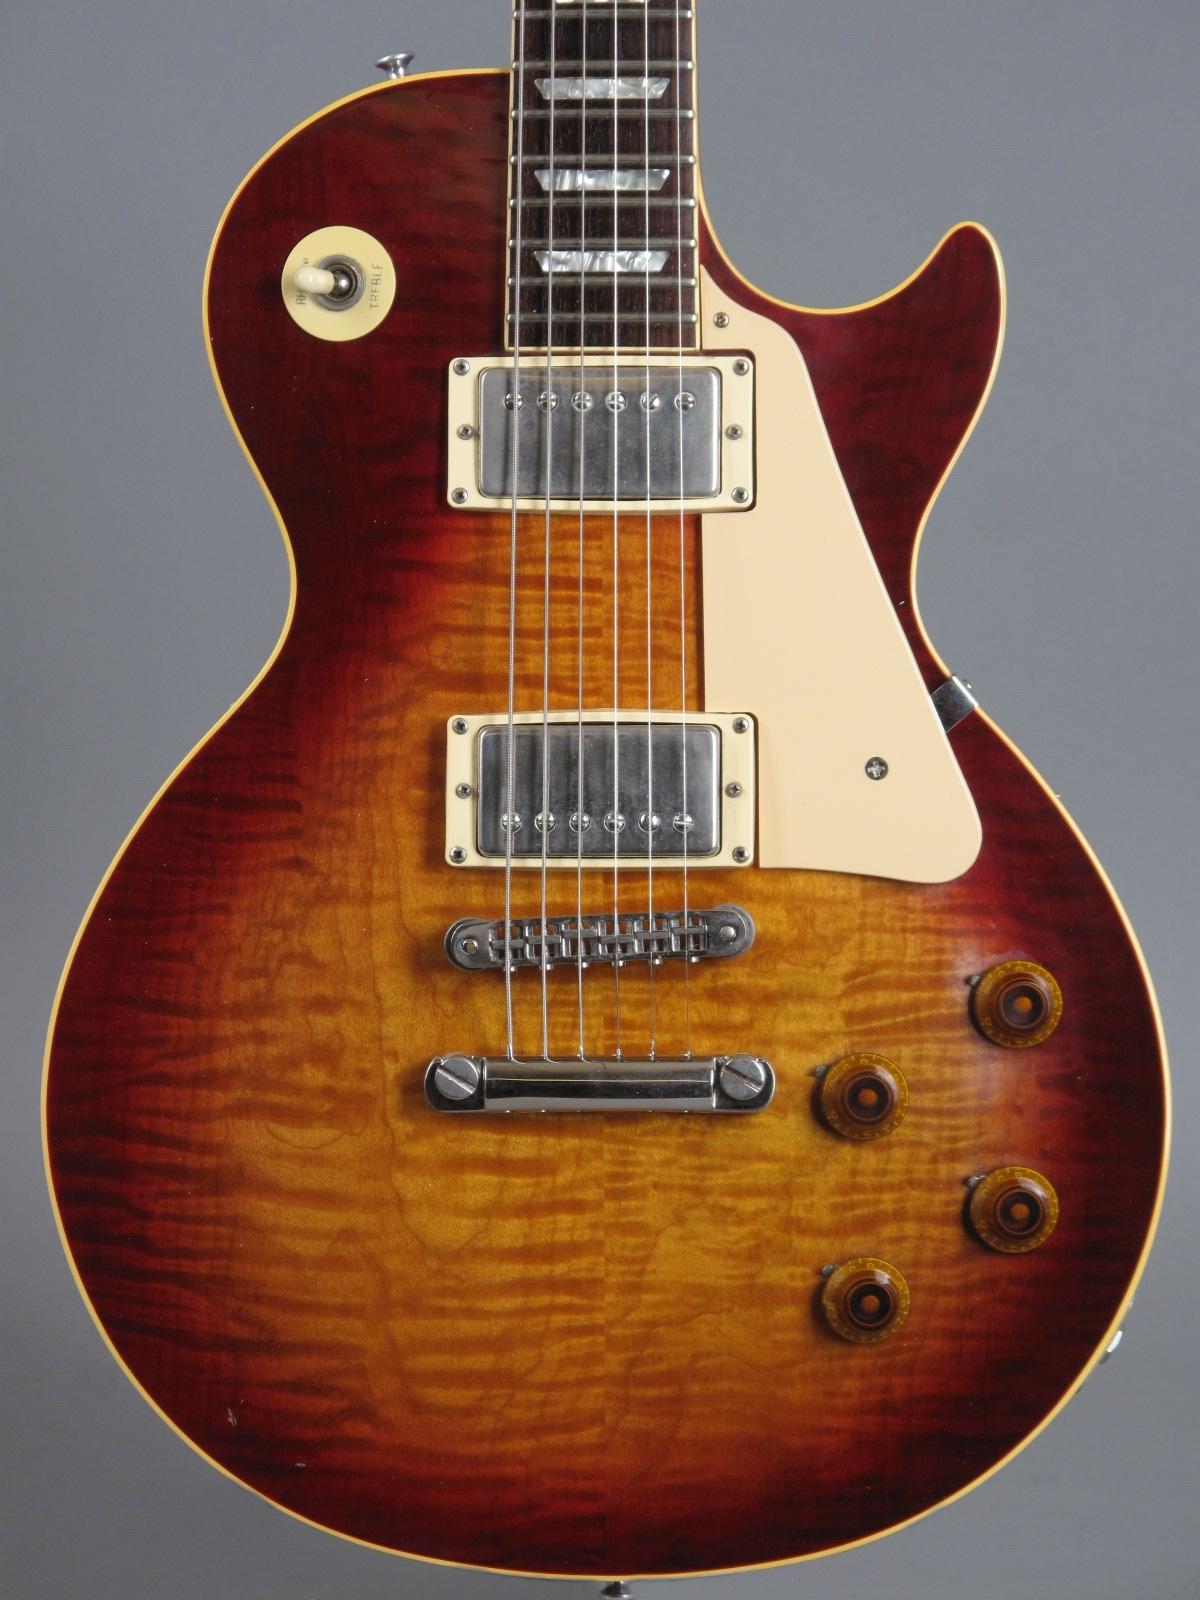 1982 Gibson Les Paul Heritage 80 - Heritage Cherry Sunburst